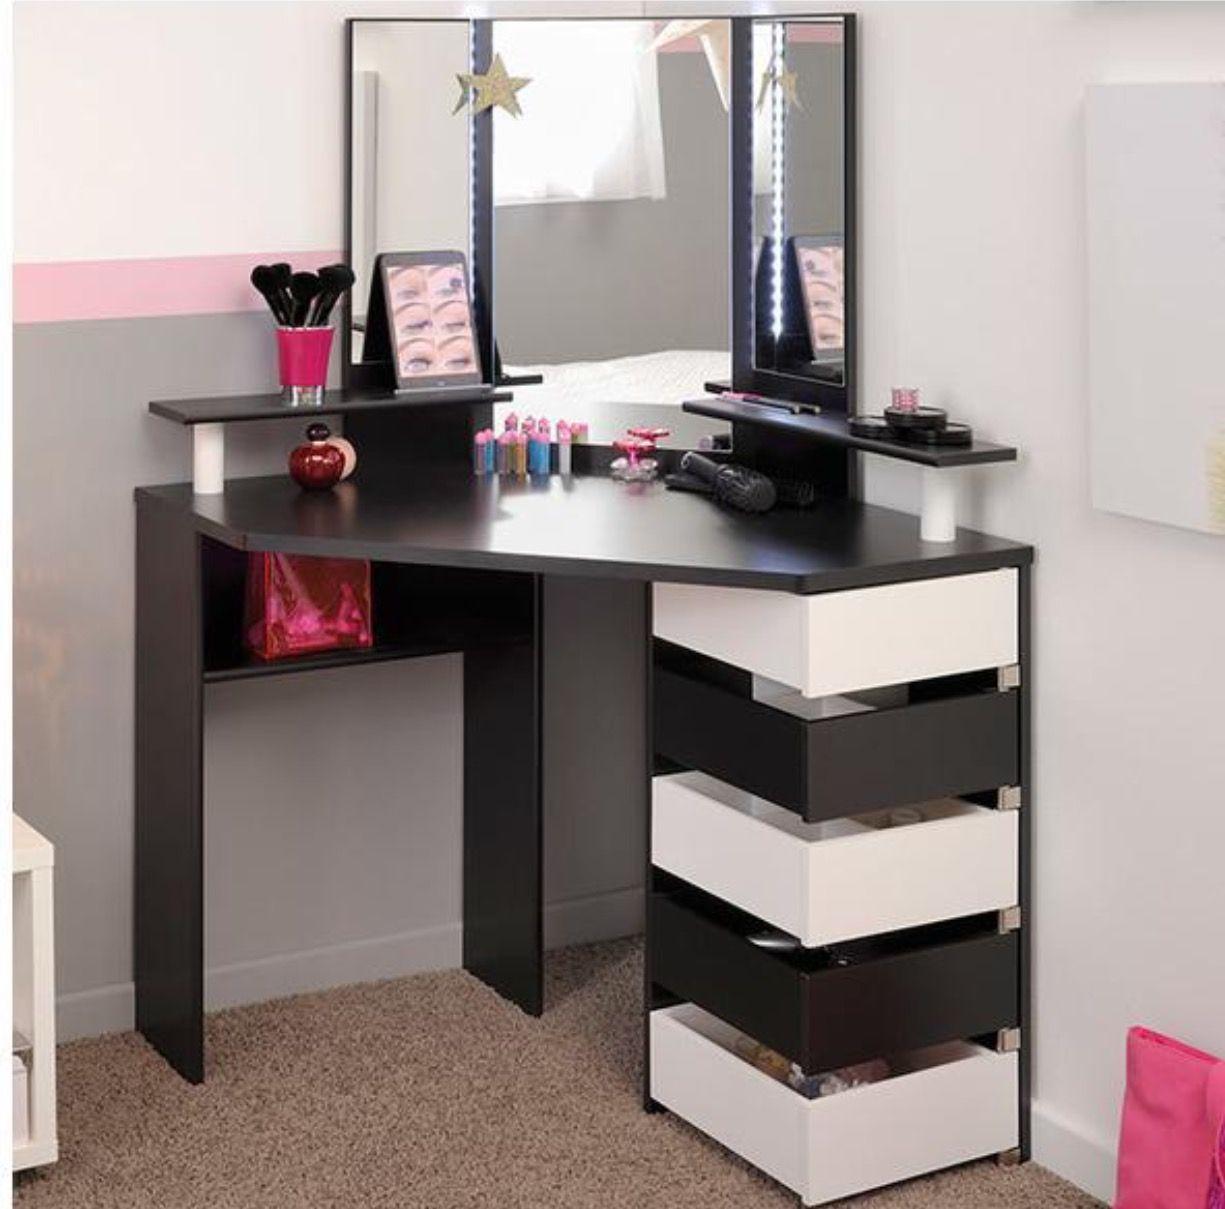 Pin de kathrynelleese en Beauty room inspiration | Pinterest ...